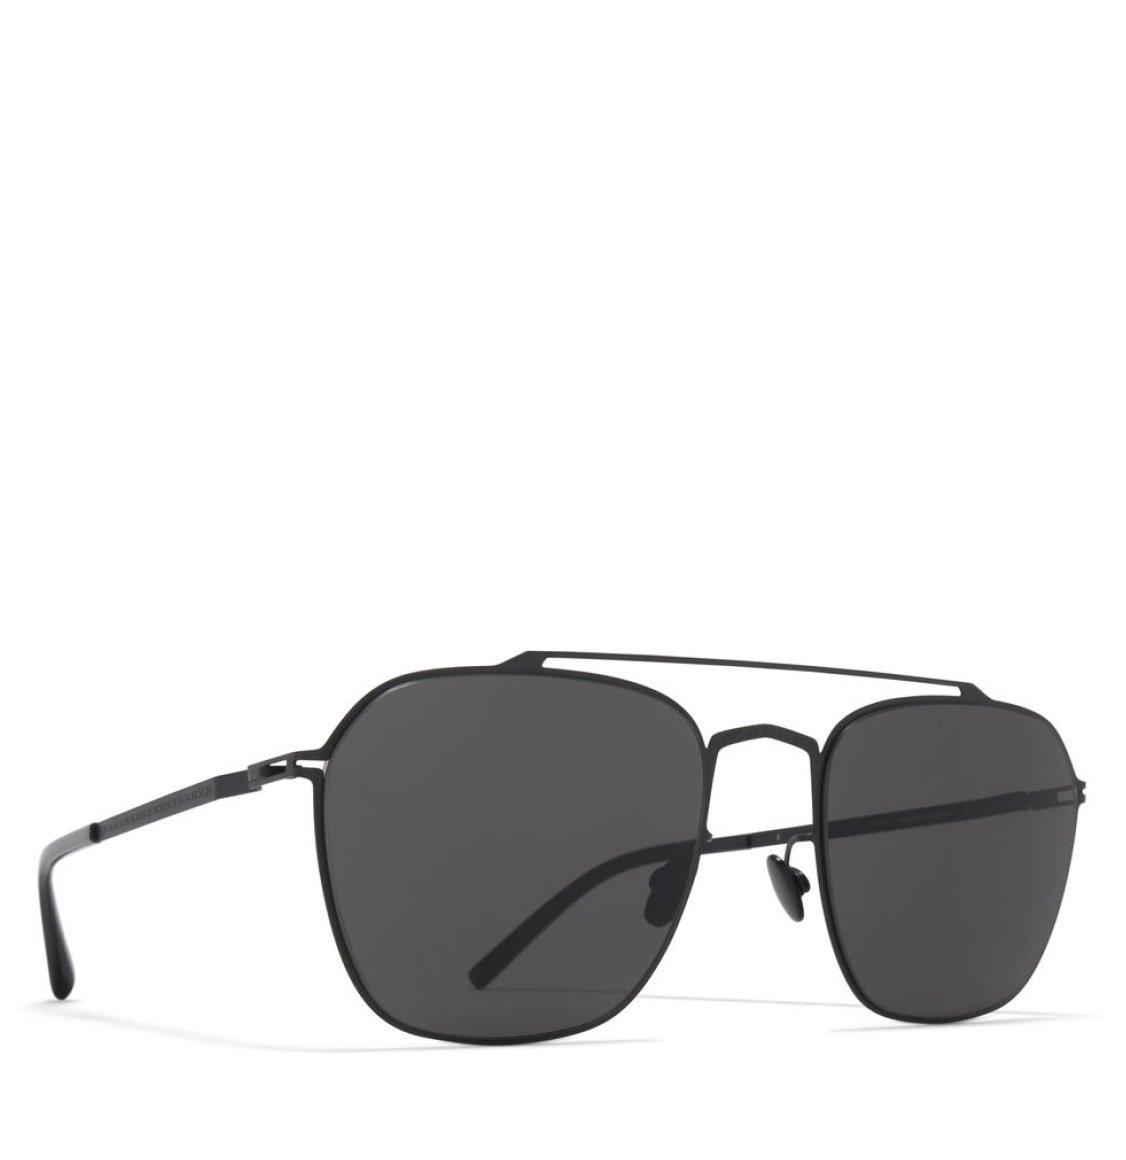 Mykita x Maison Martin Margiela Square Shape Black Sunglasses